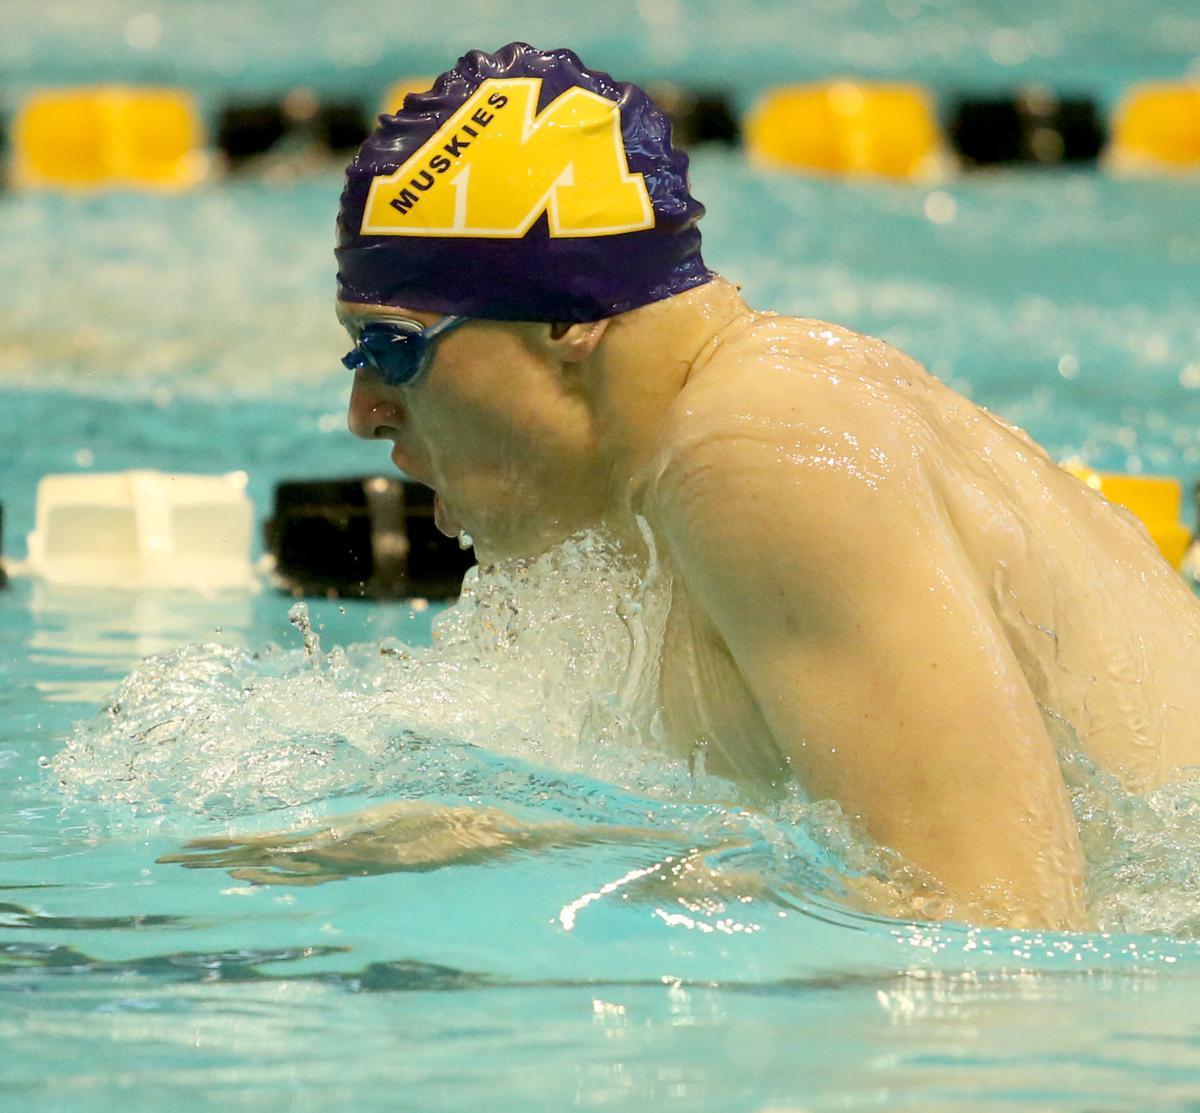 020919-qct-spt-boys-state-swim-032